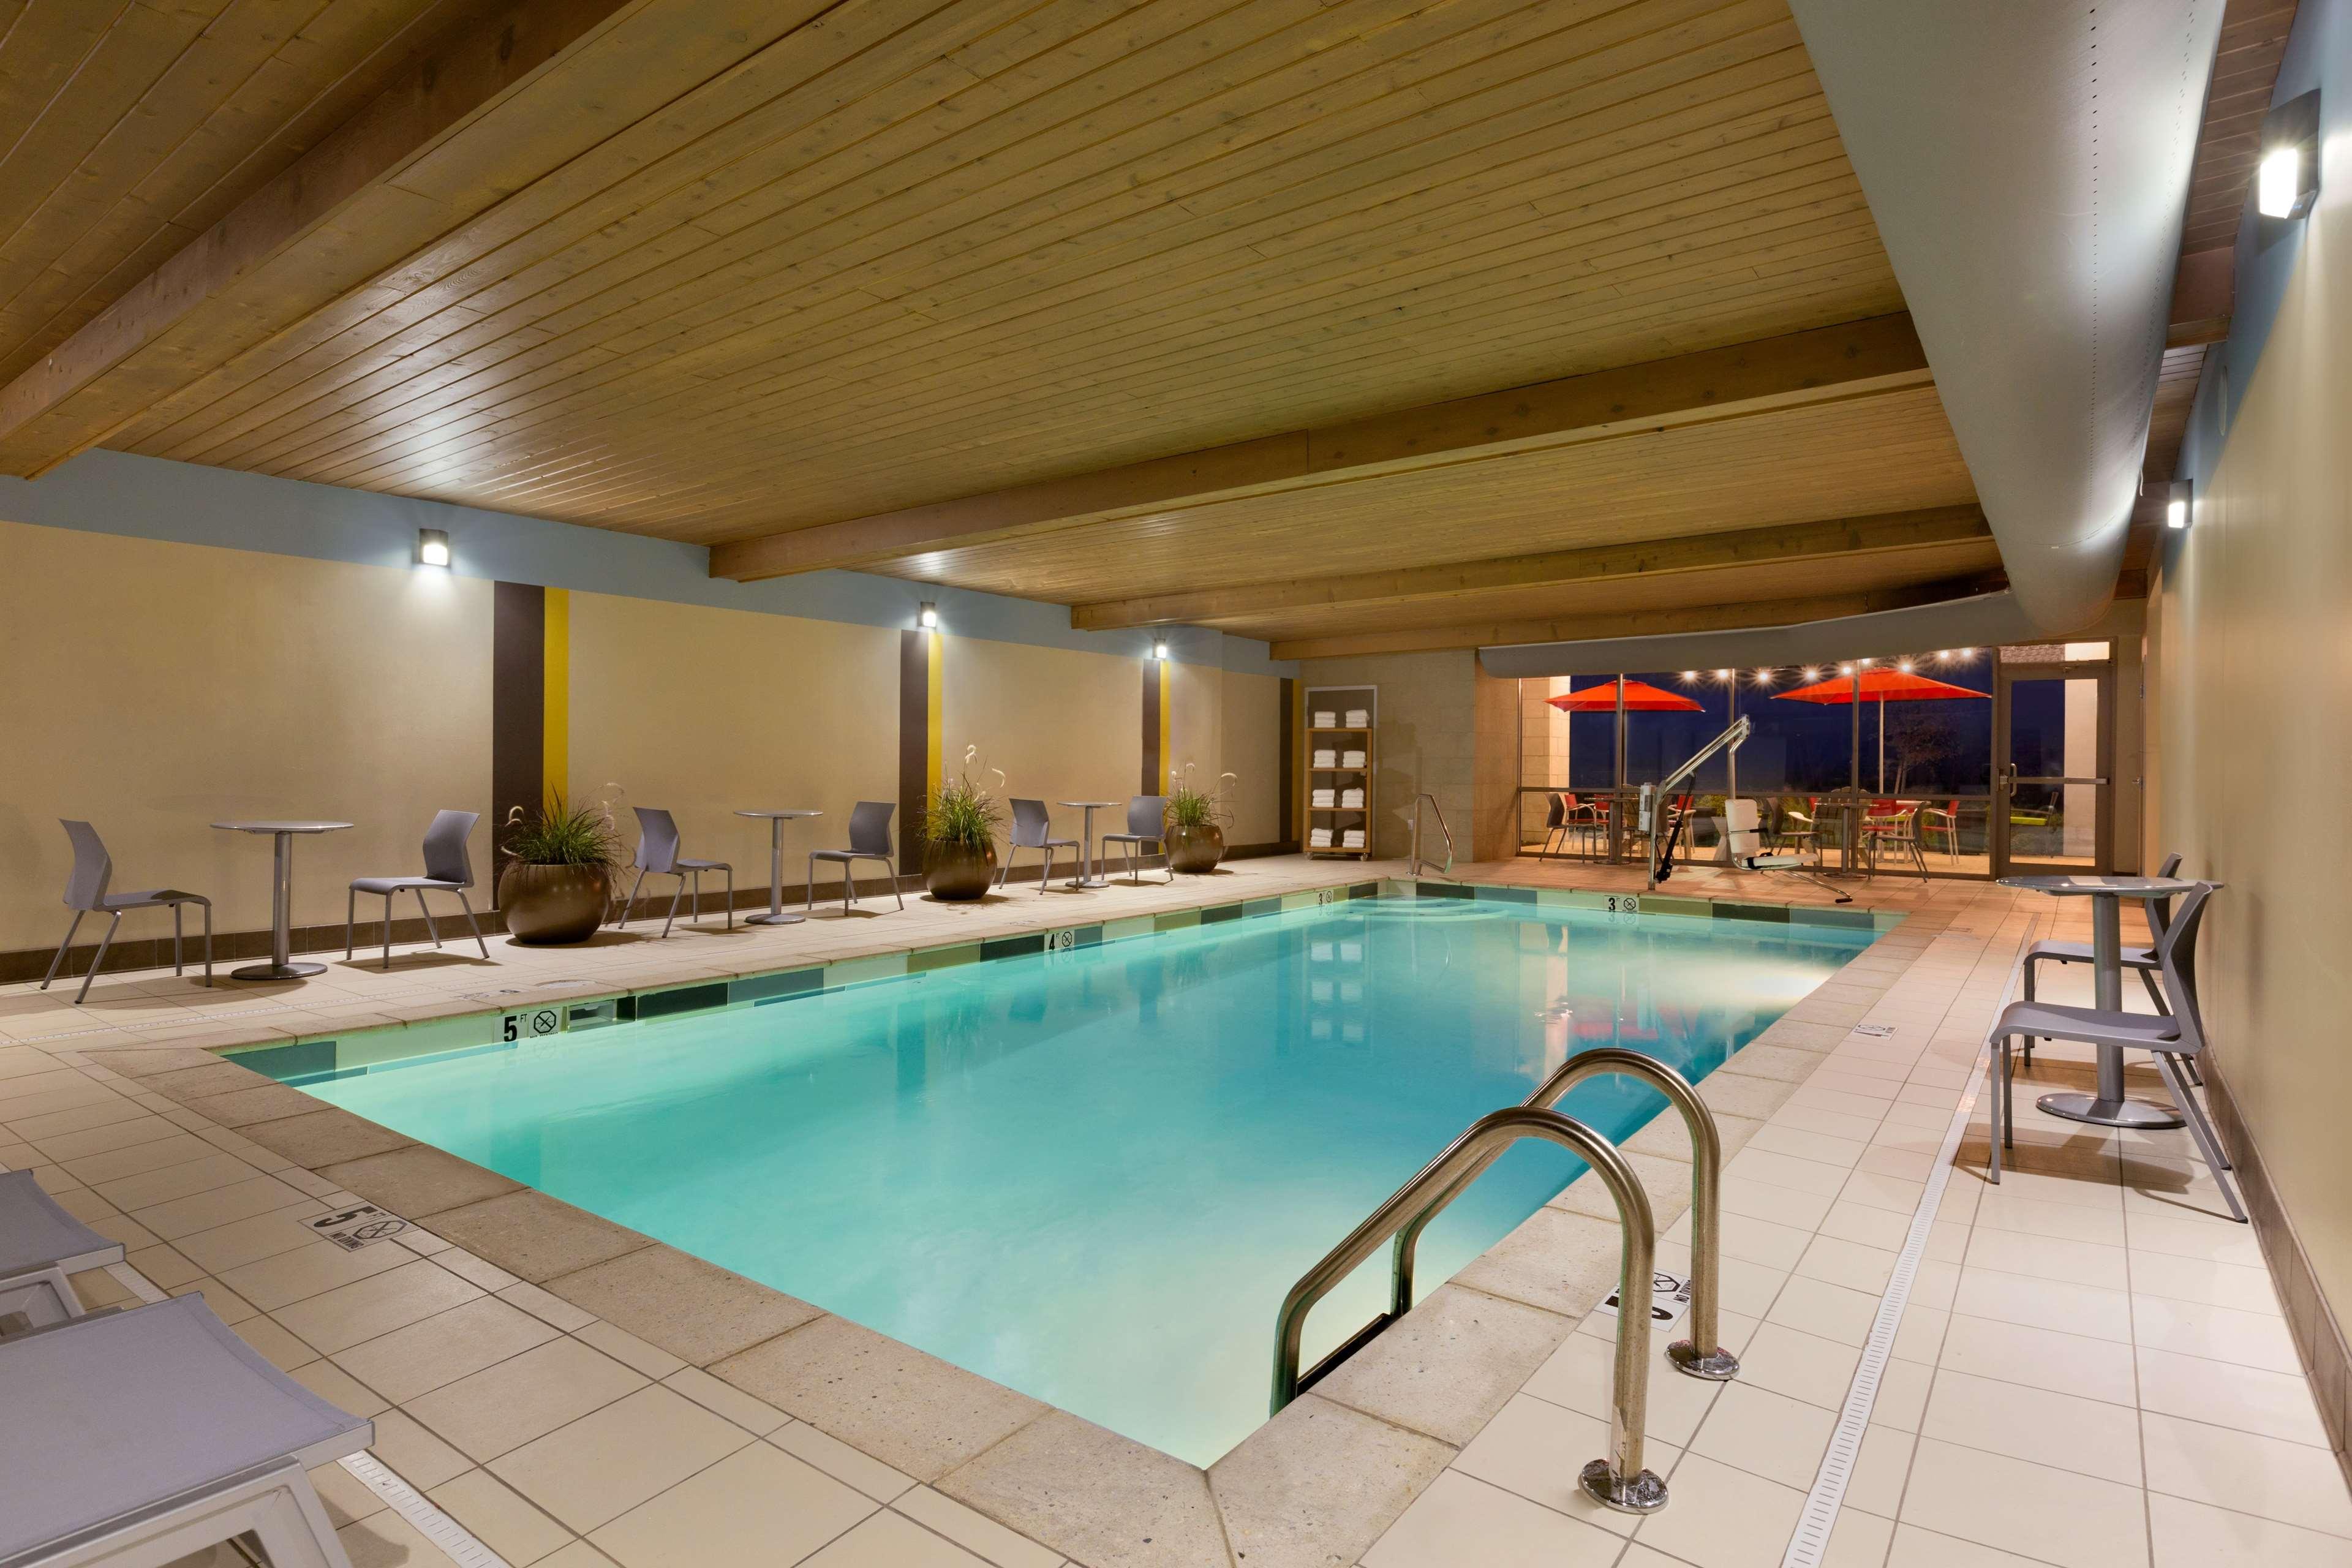 Home2 Suites by Hilton Cincinnati Liberty Township image 1